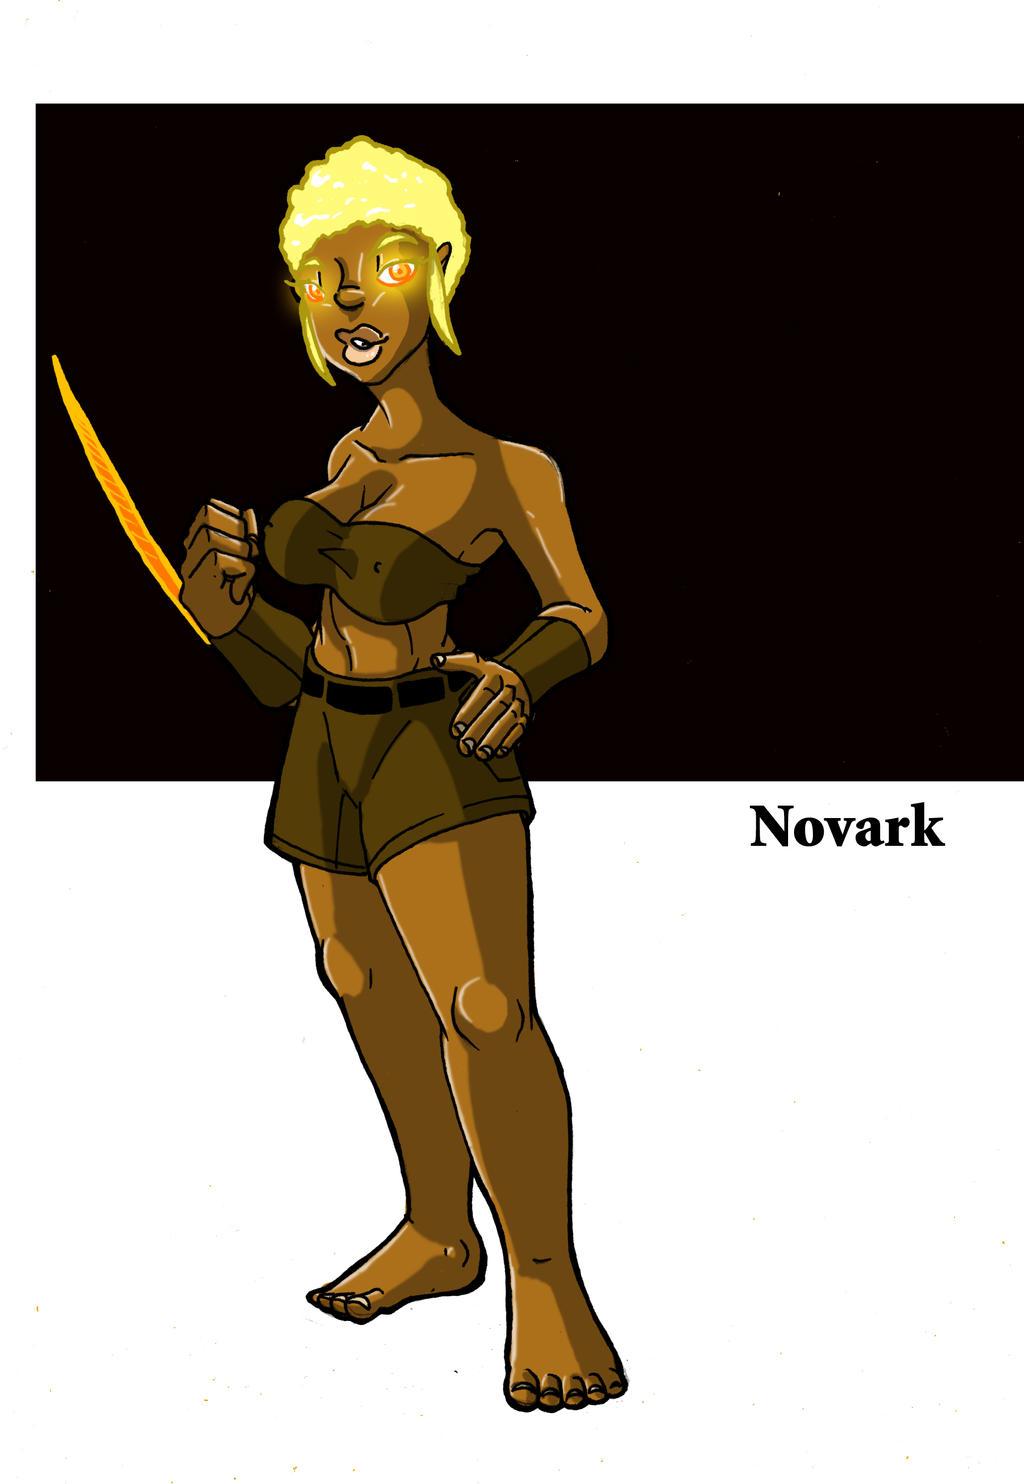 Novarkorovu's Profile Picture